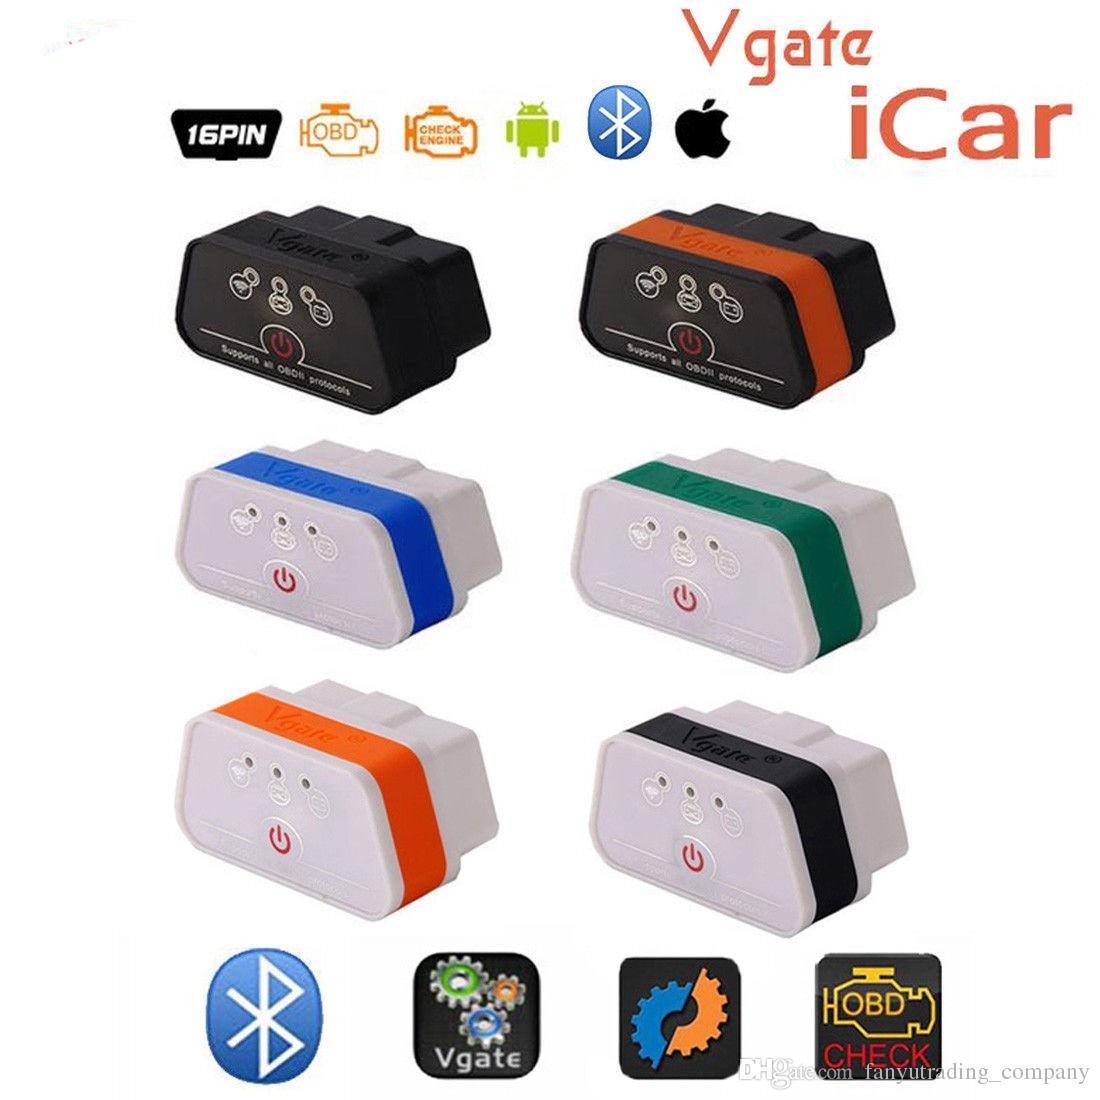 Original ELM327 Bluetooth ICar 2 Self Diagnosis OBDII BT Detector Vgate  Icar2 OBD Elm327 Bluetooth OBD2 Professional Solution DHL Free